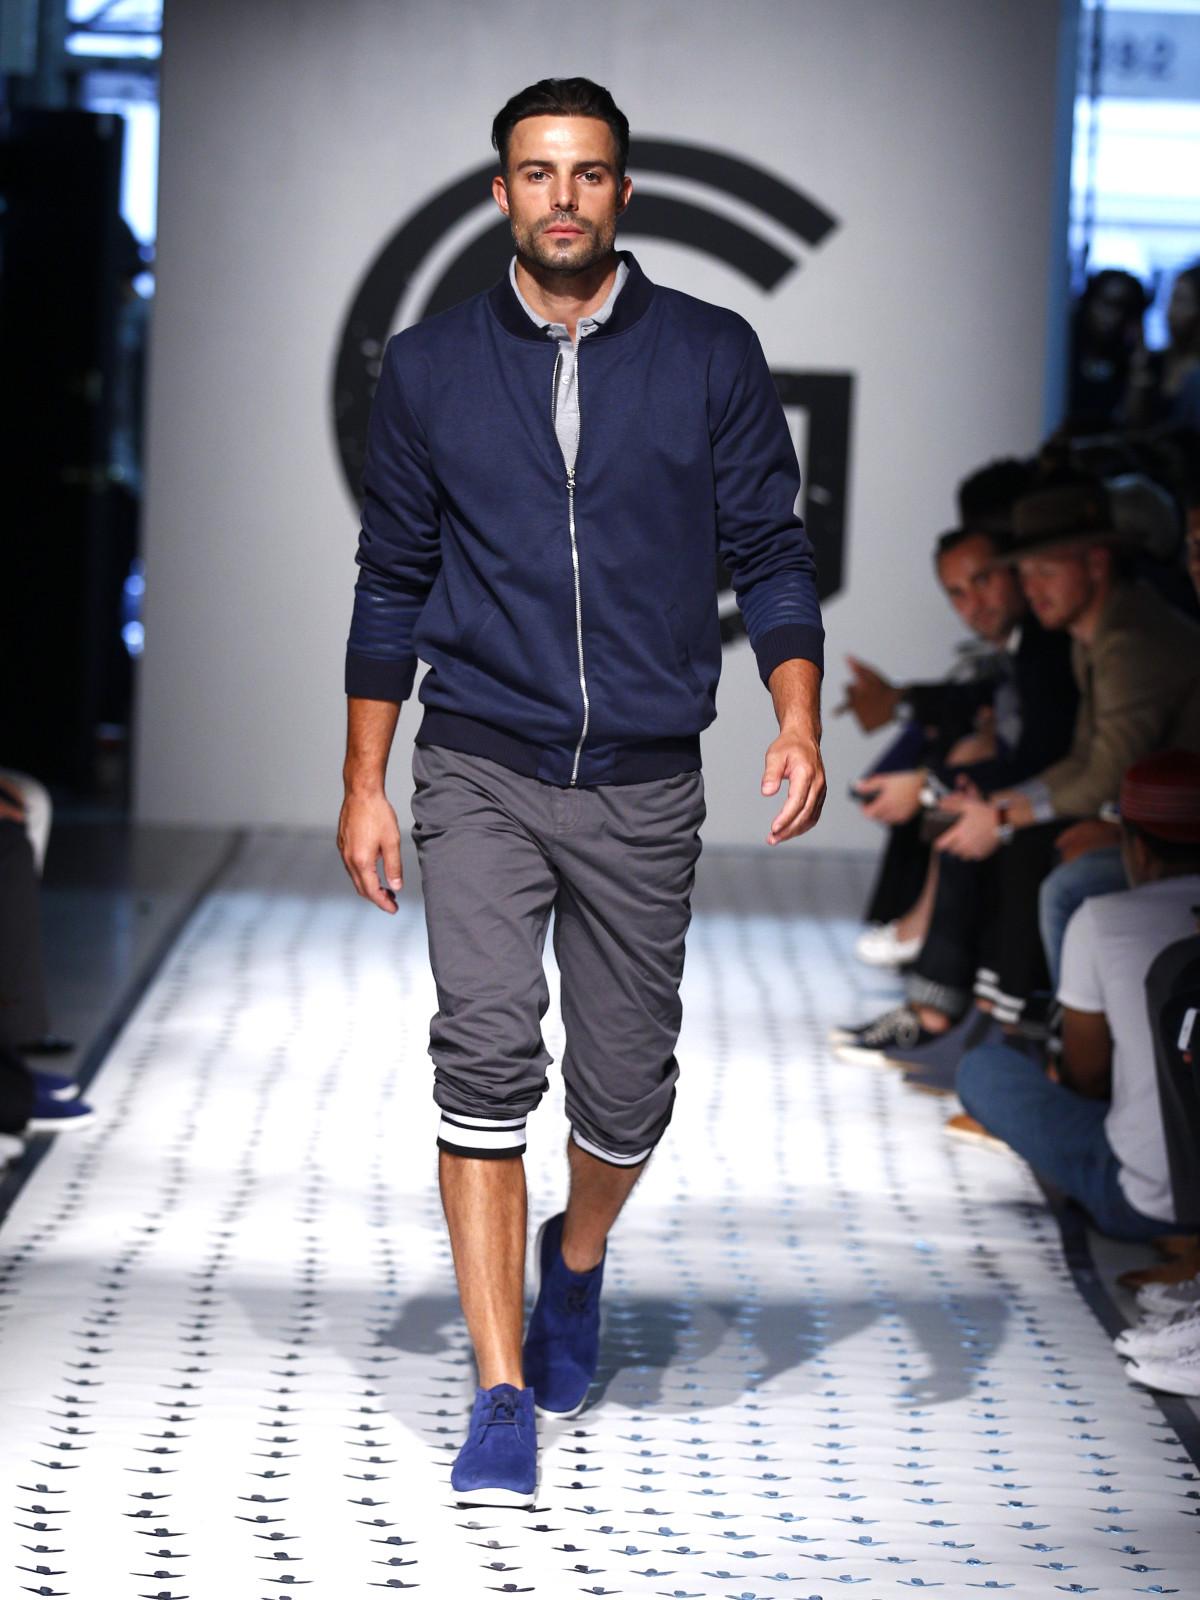 1e3988490716 New York Men s Fashion Week Grungy Gentleman spring summer 2016 coat